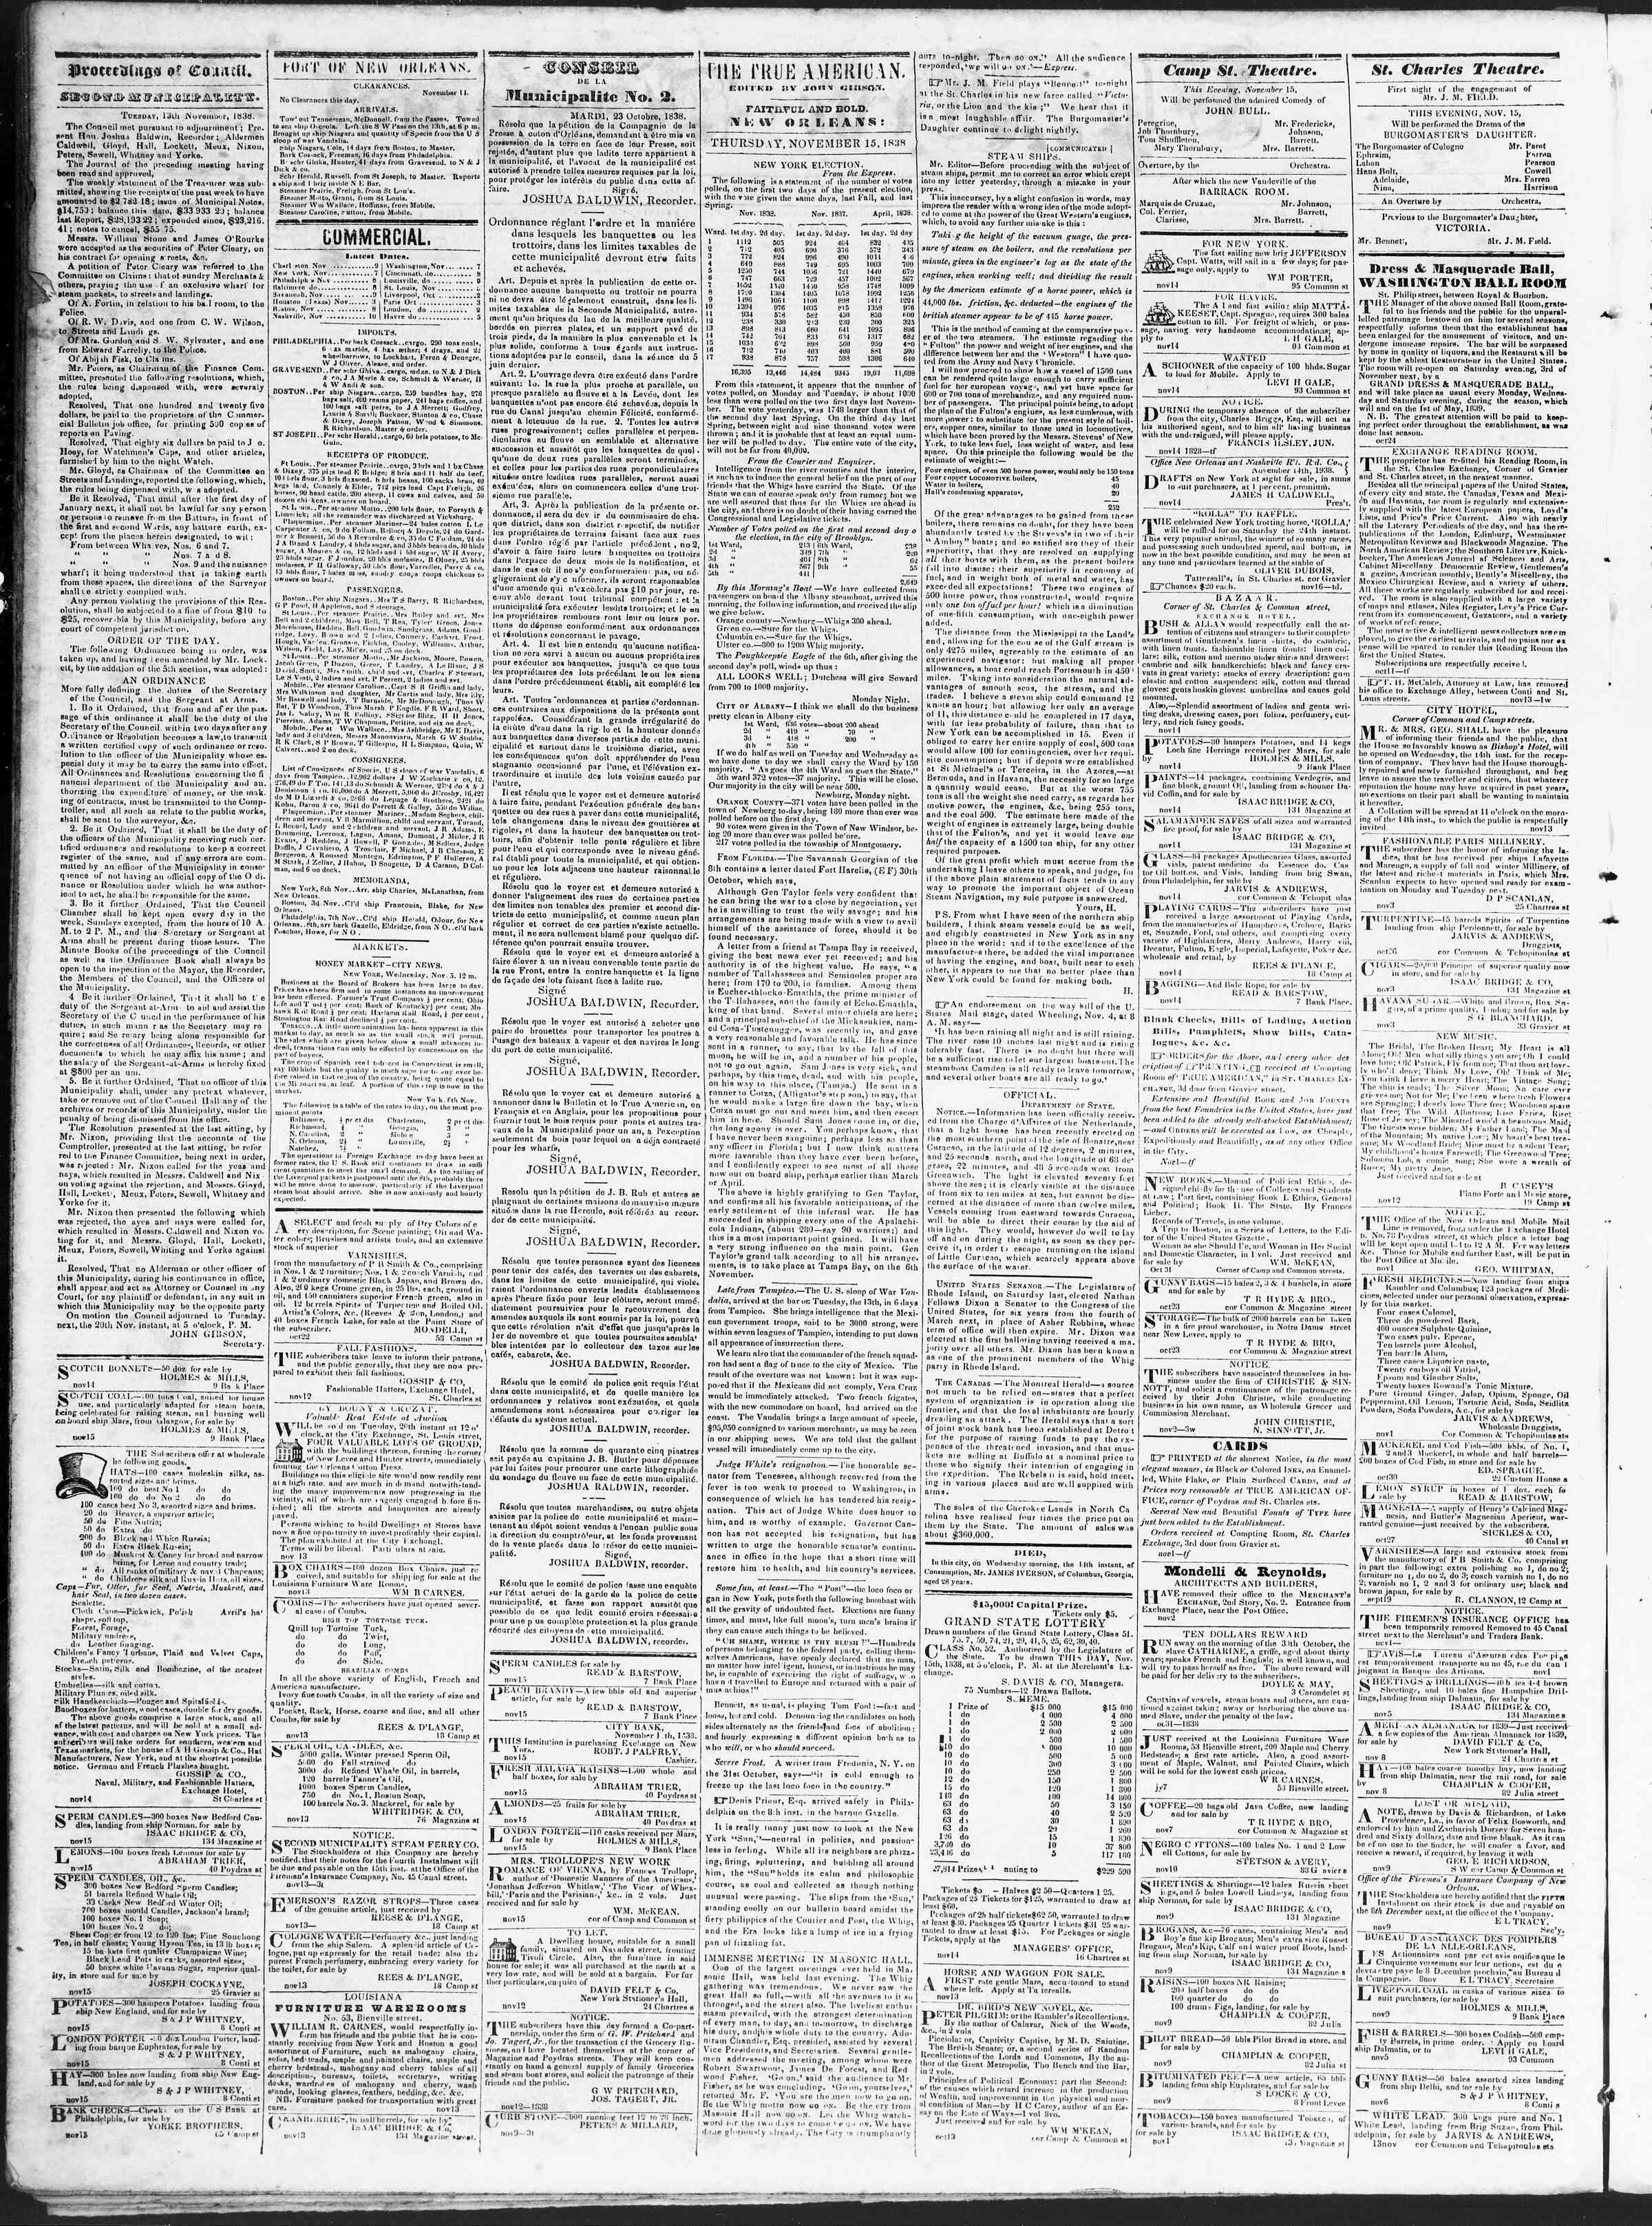 November 15, 1838 Tarihli True American Gazetesi Sayfa 2